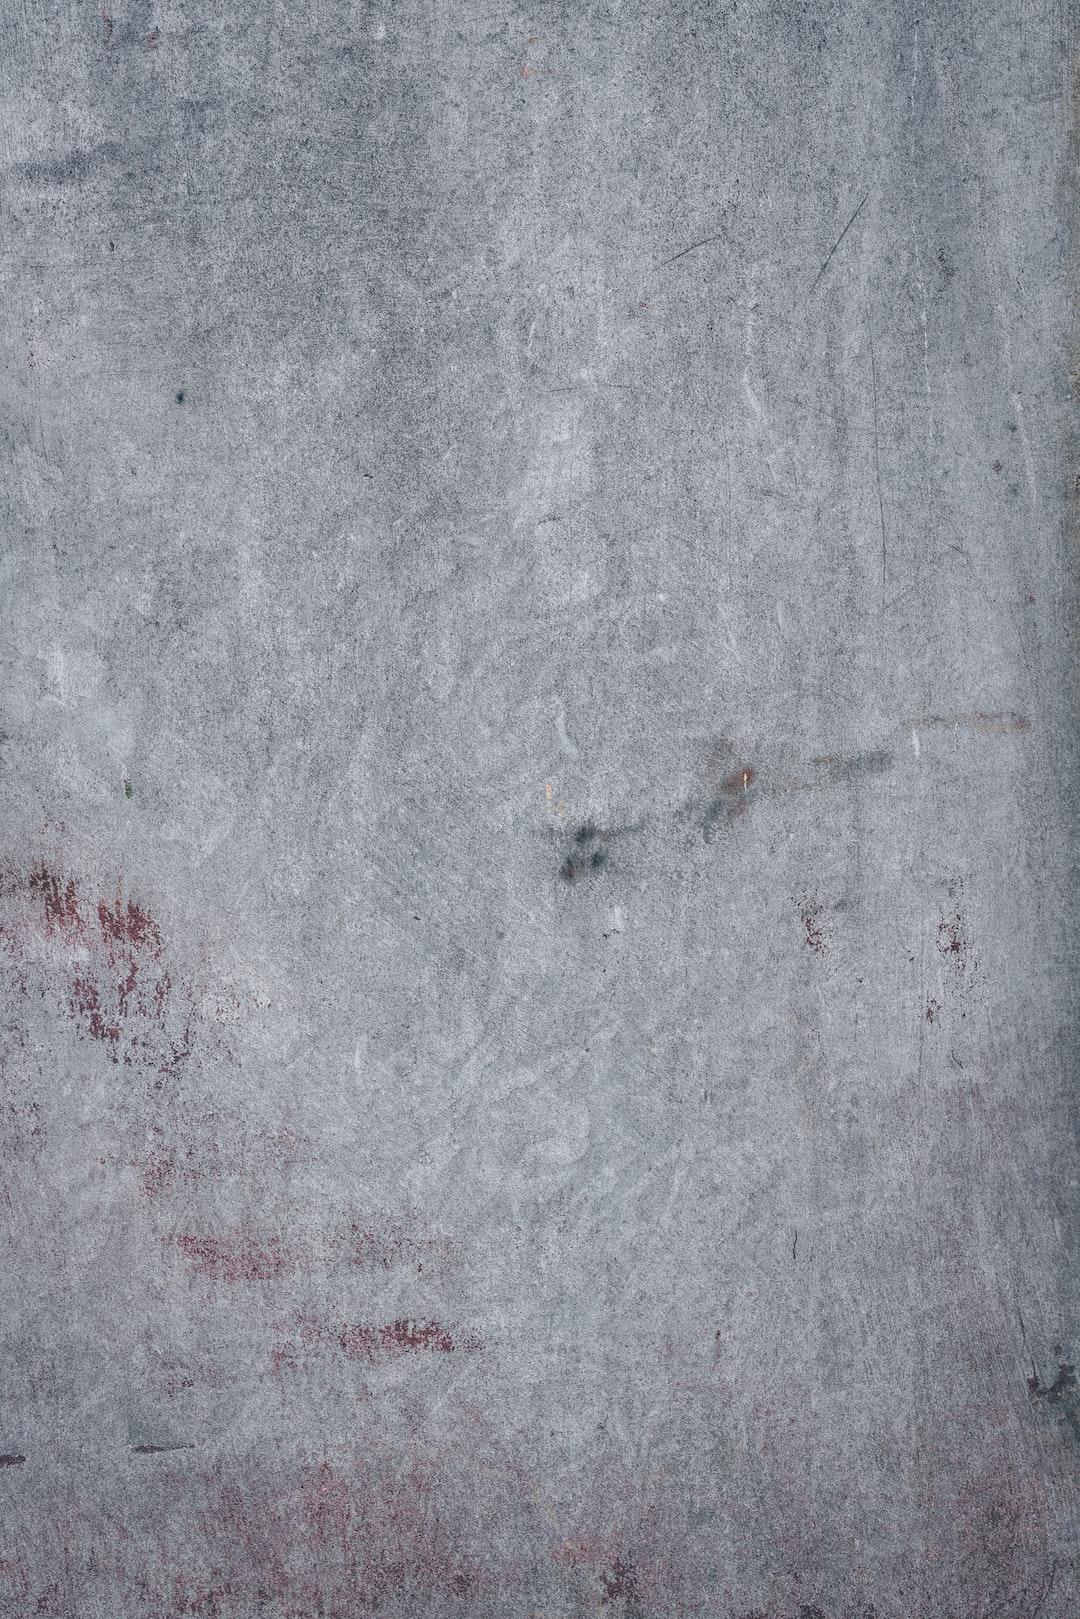 Old stone textured plain background